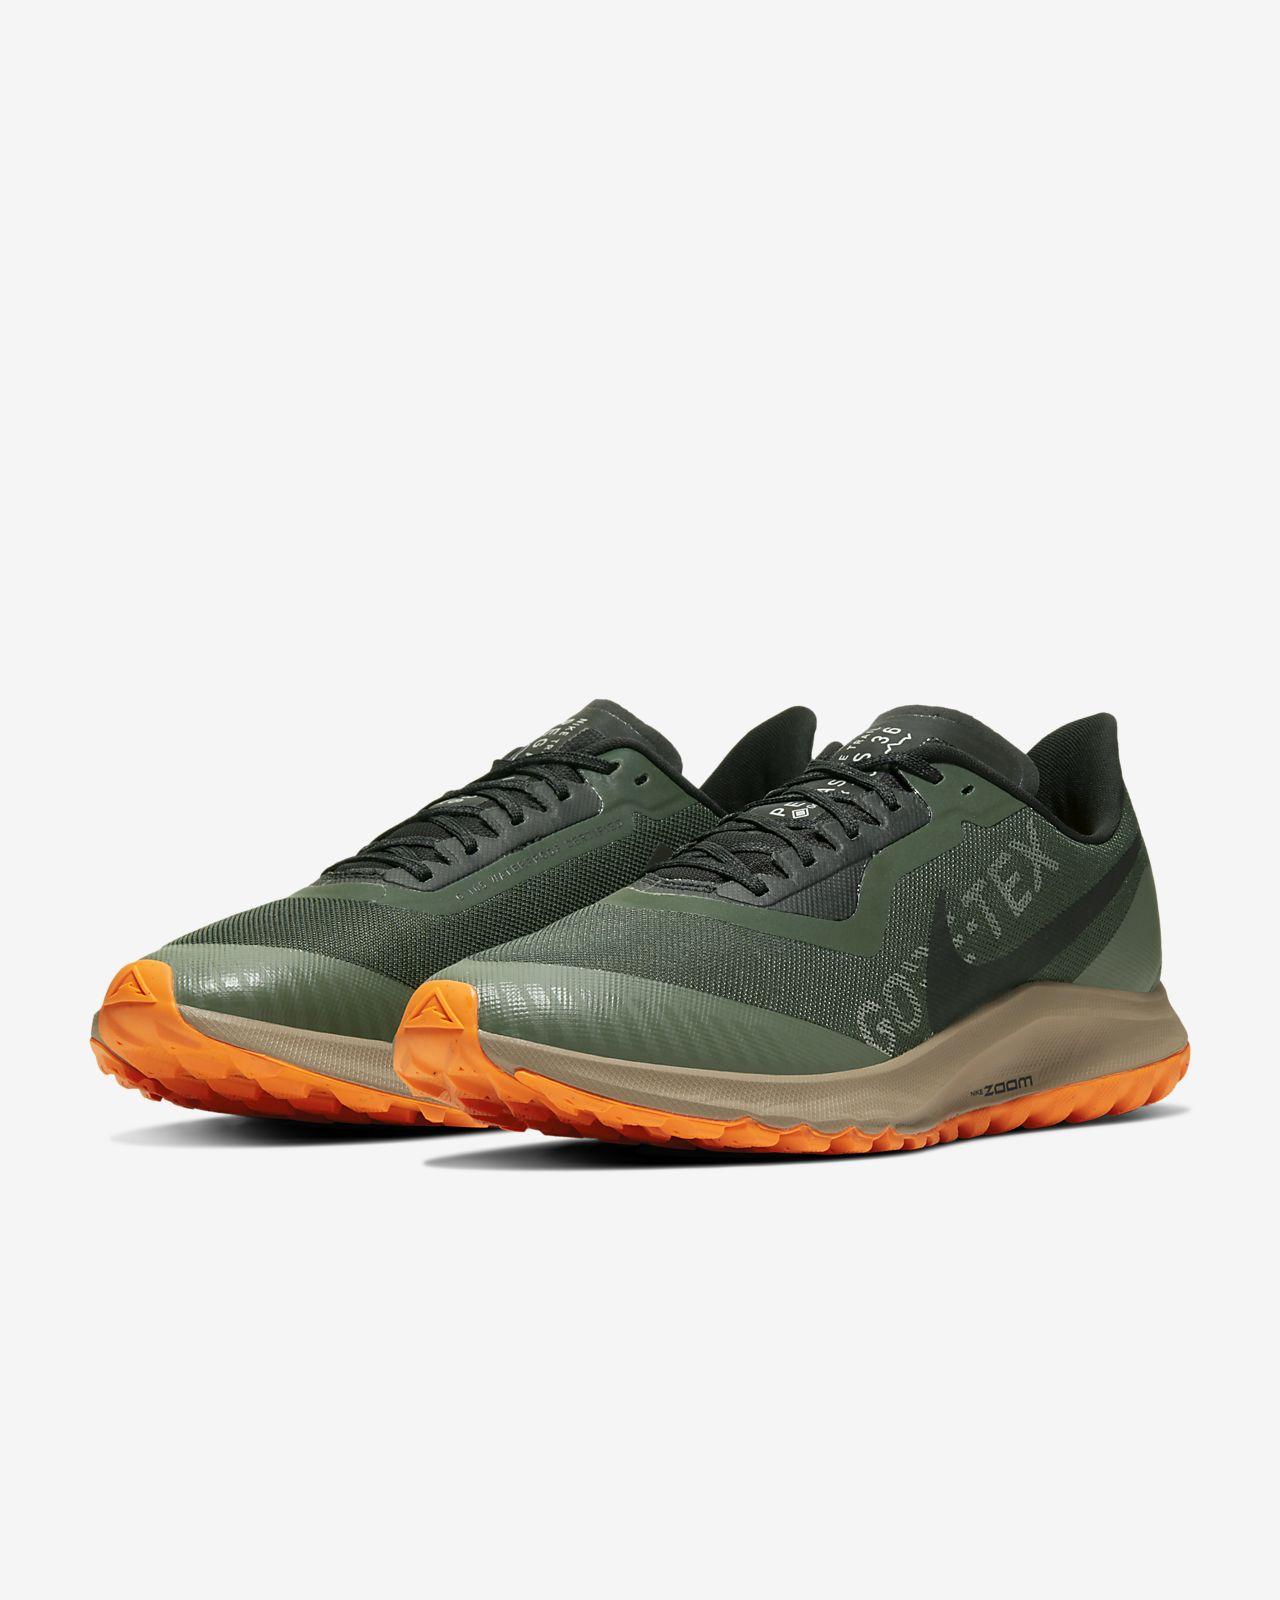 Calzado de trail running para hombre Nike Zoom Pegasus 36 Trail GORE-TEX